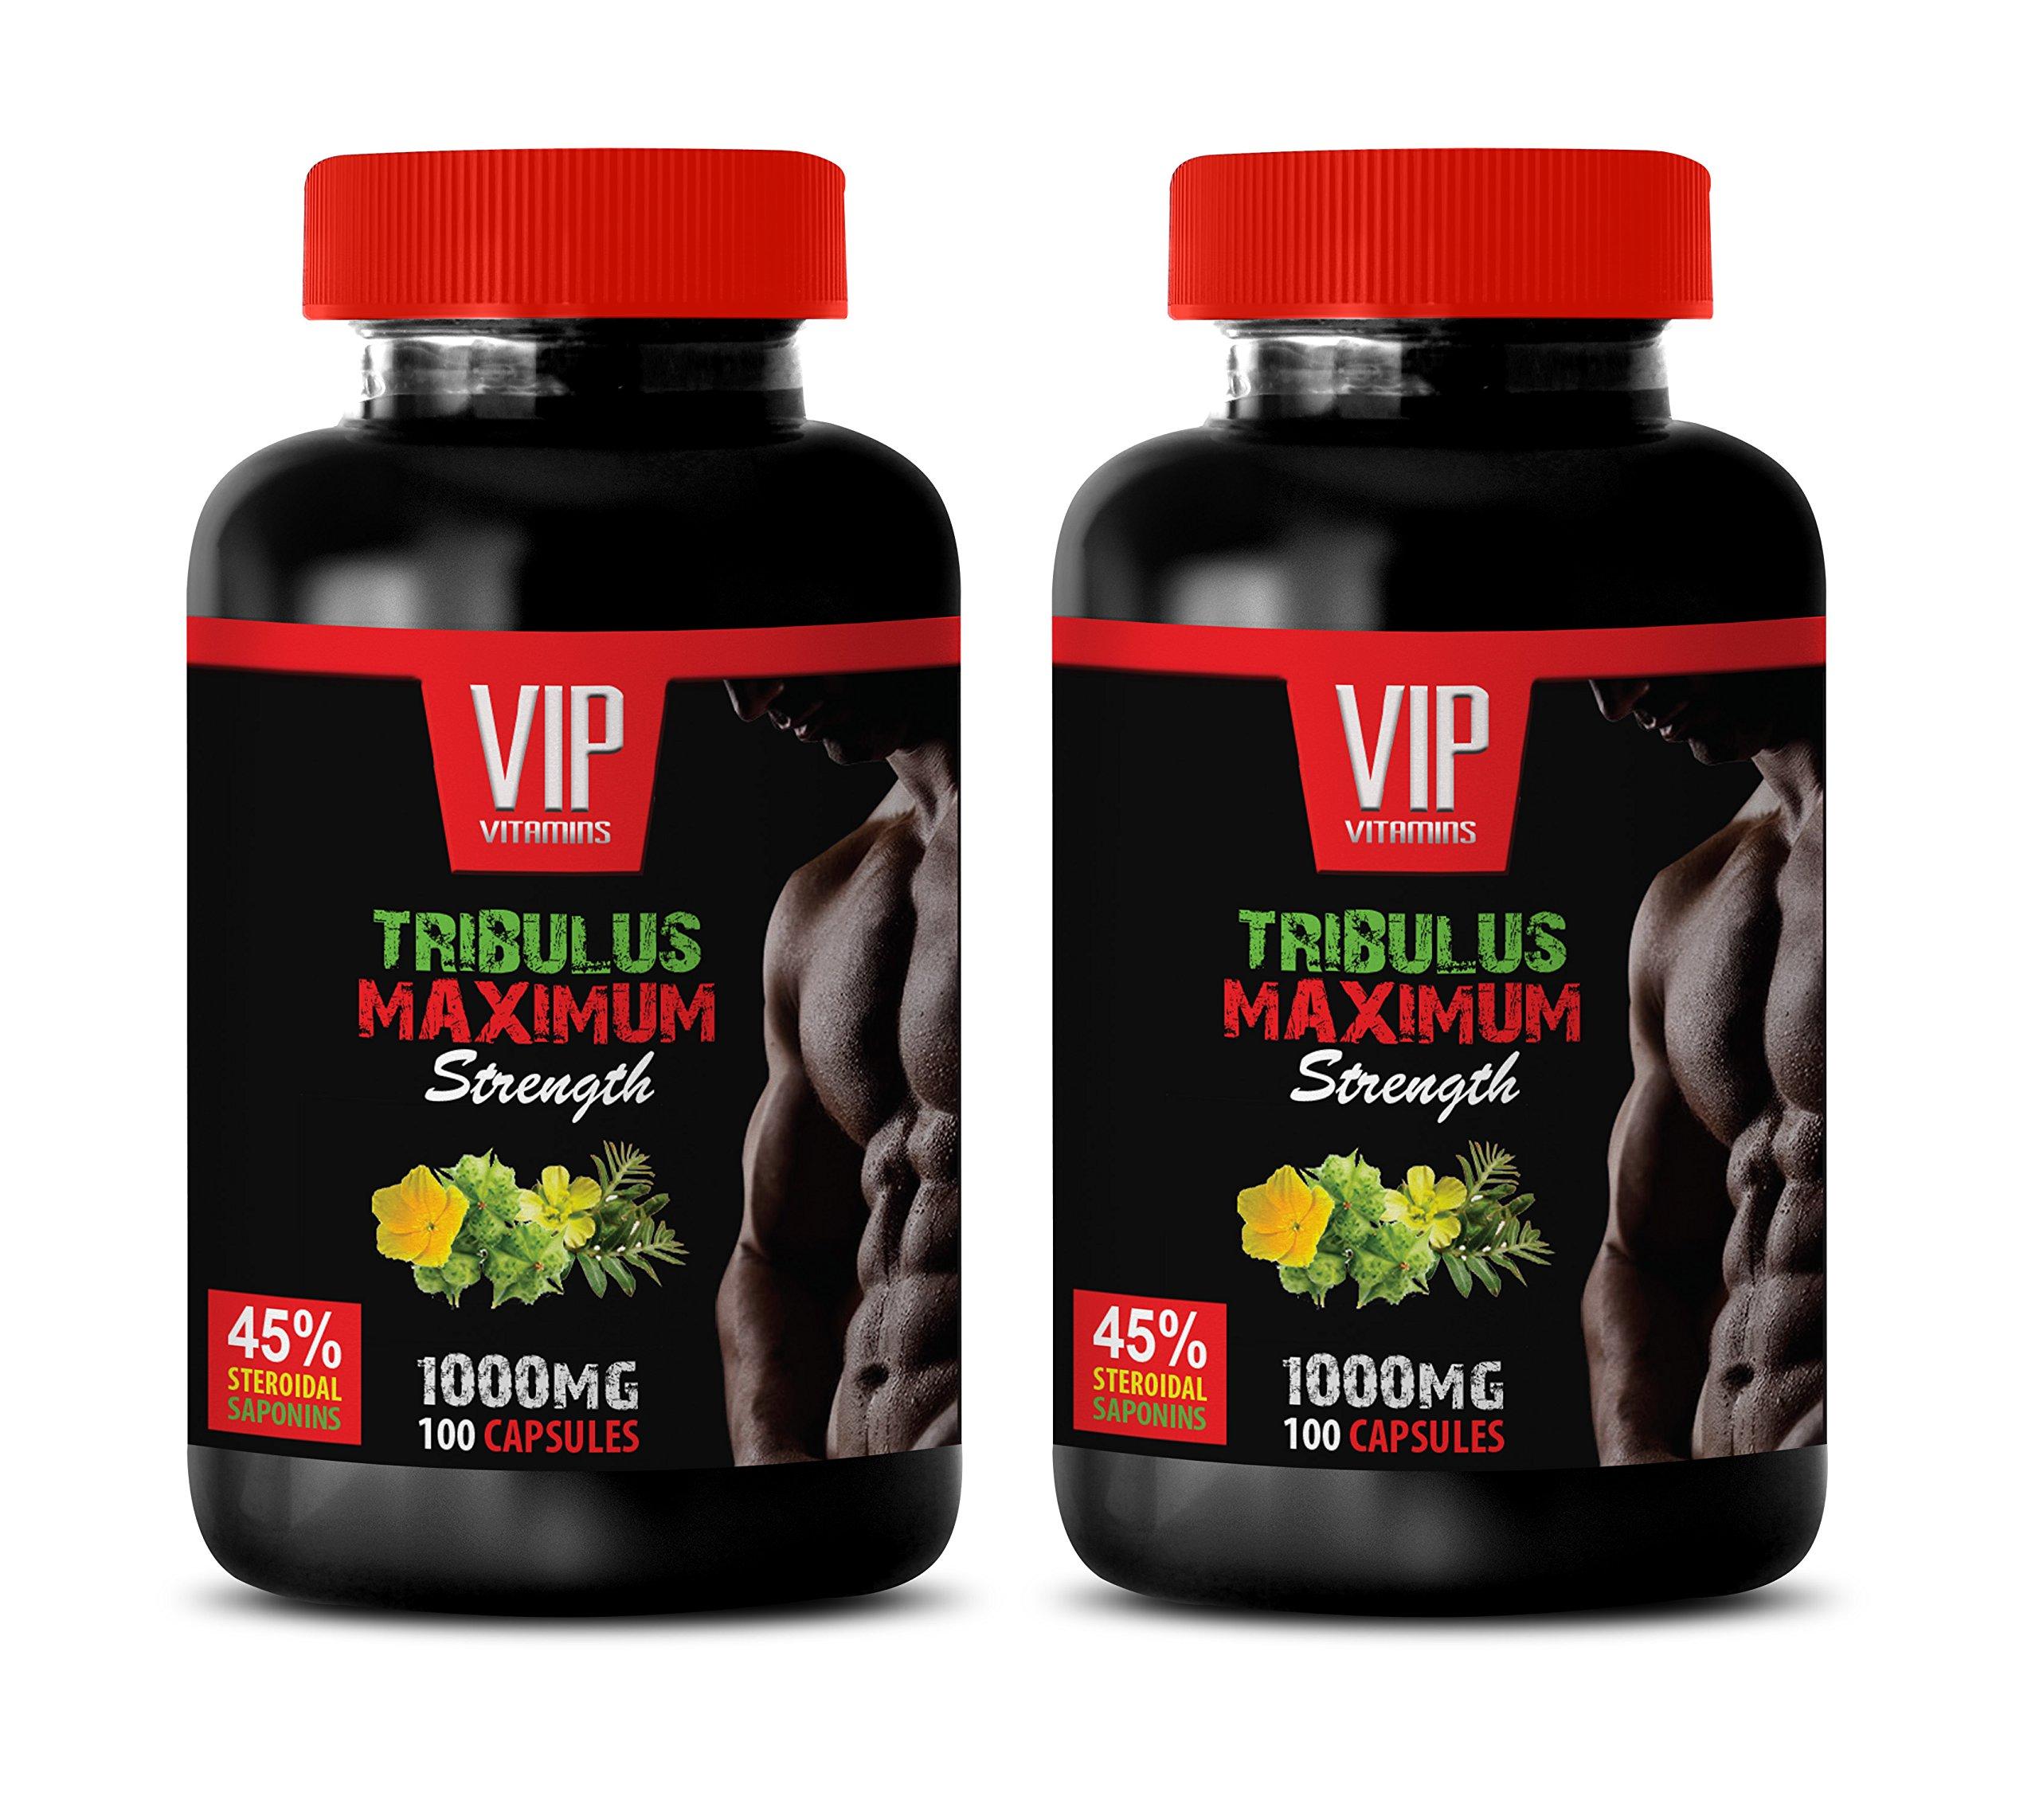 testosterone booster with estrogen blocker for men - TRIBULUS TERRESTRIS MAXIMUM STRENGTH - 45% STEROIDAL SAPONINS - tribulus natural - 2 Bottles (200 Capsules)